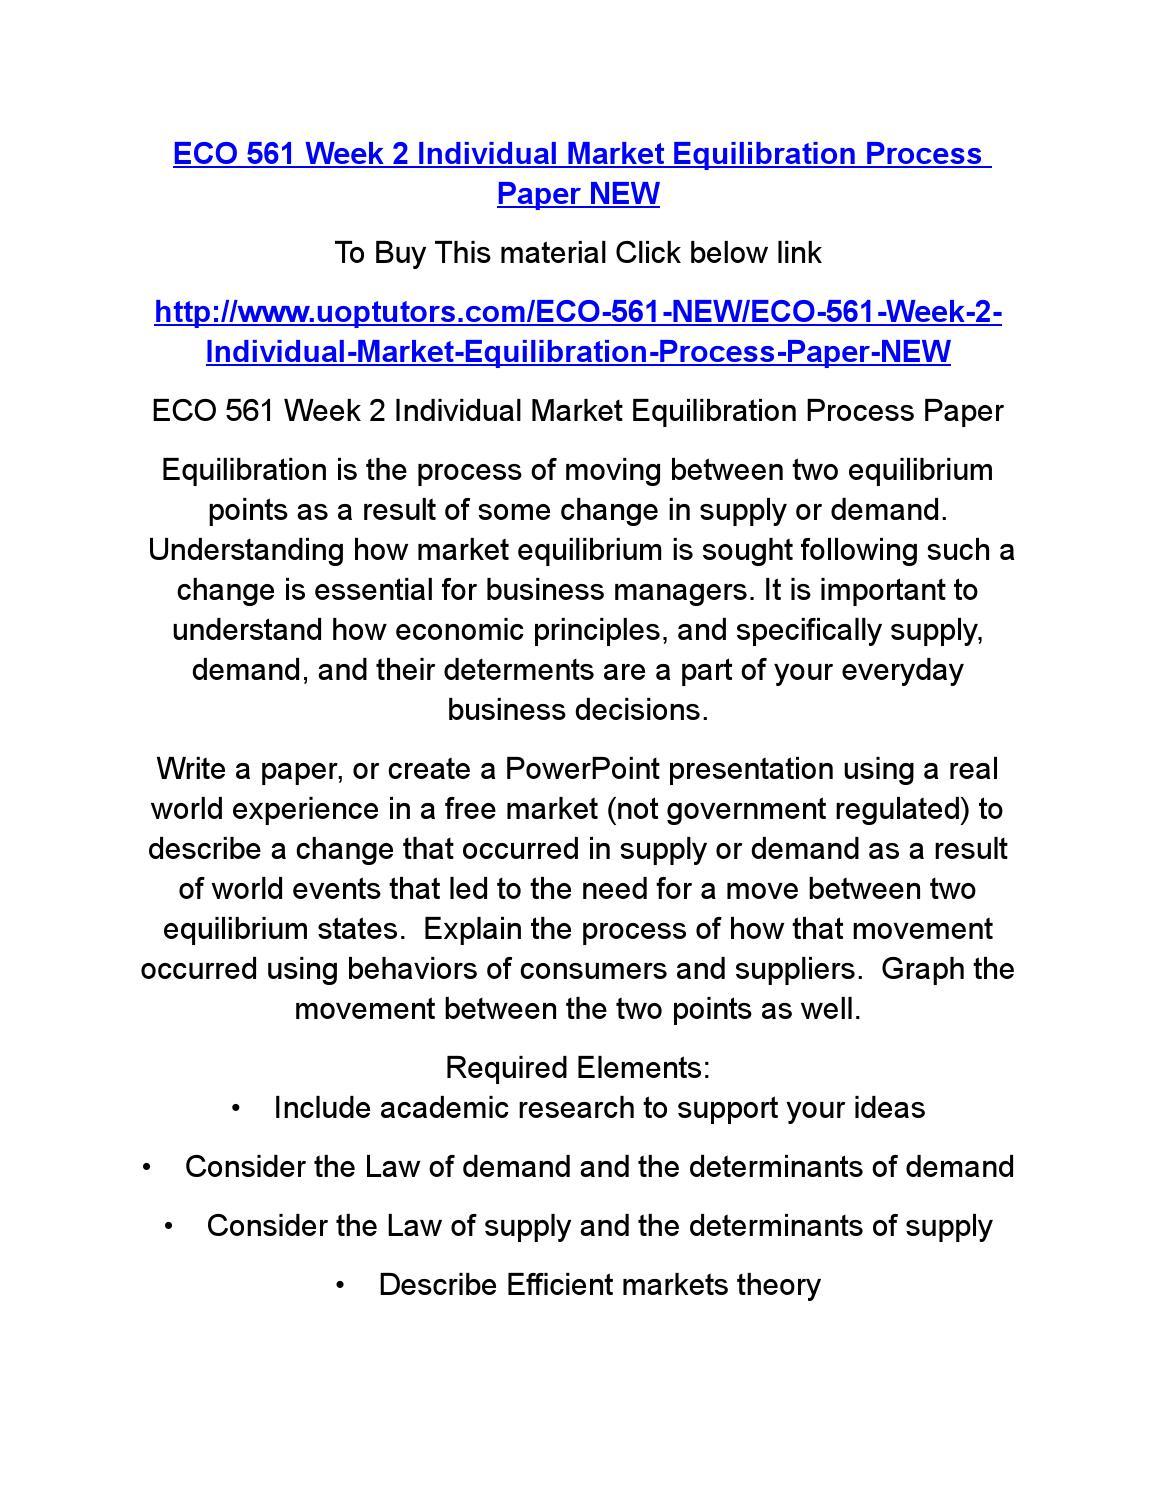 market equilibration process essay Running head: market equilibrating process paper market equilibrating process paper lazaro alfonso eco 561 university of phoenix prof - market equilibrium process introduction.